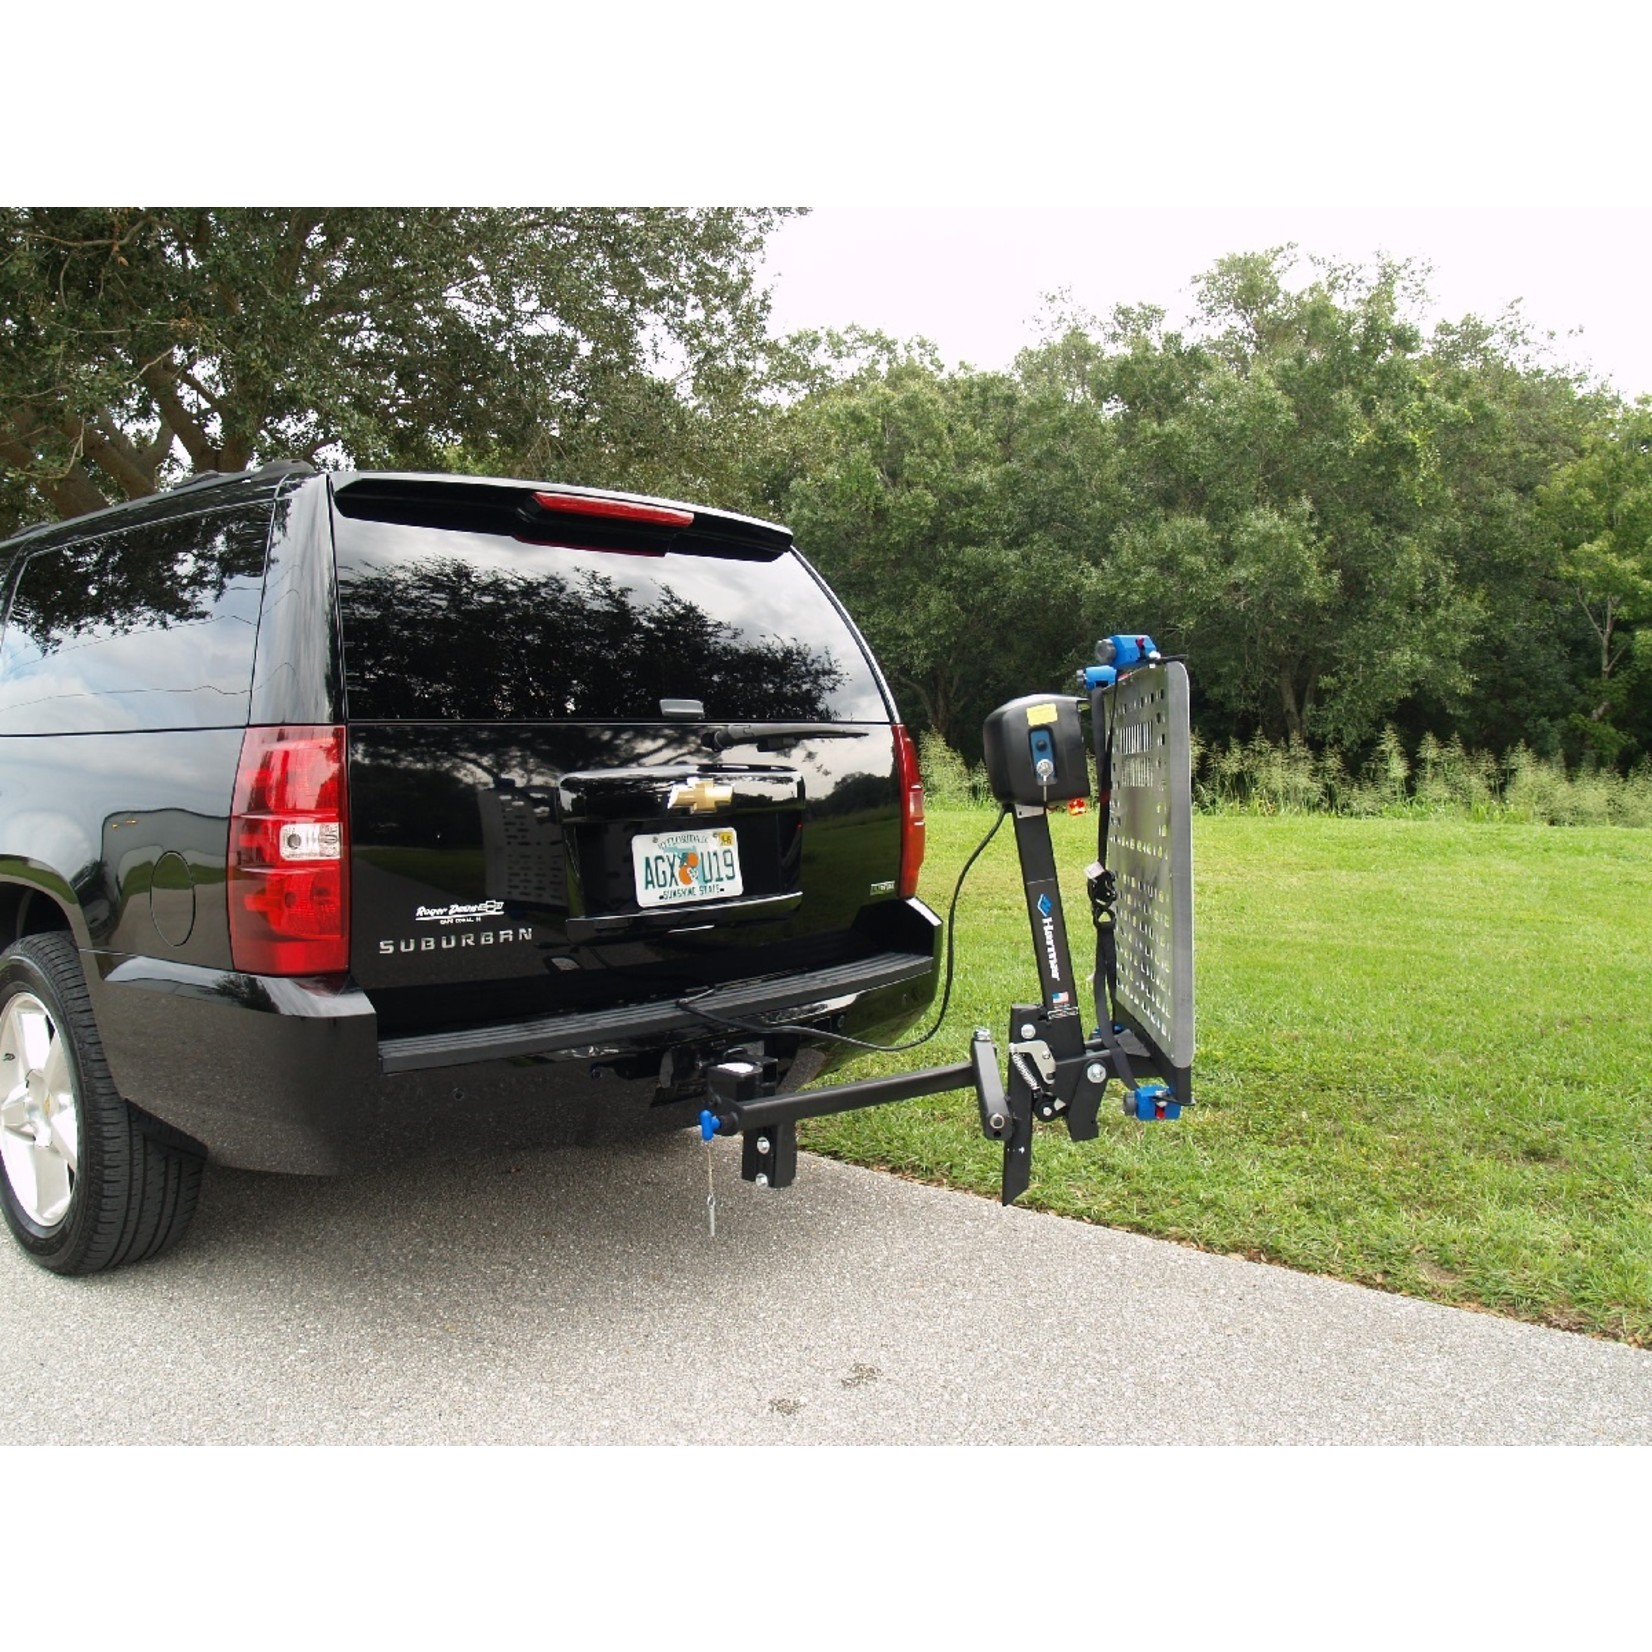 Harmar Mobility AL105L Lightweight Swing-Away Lift